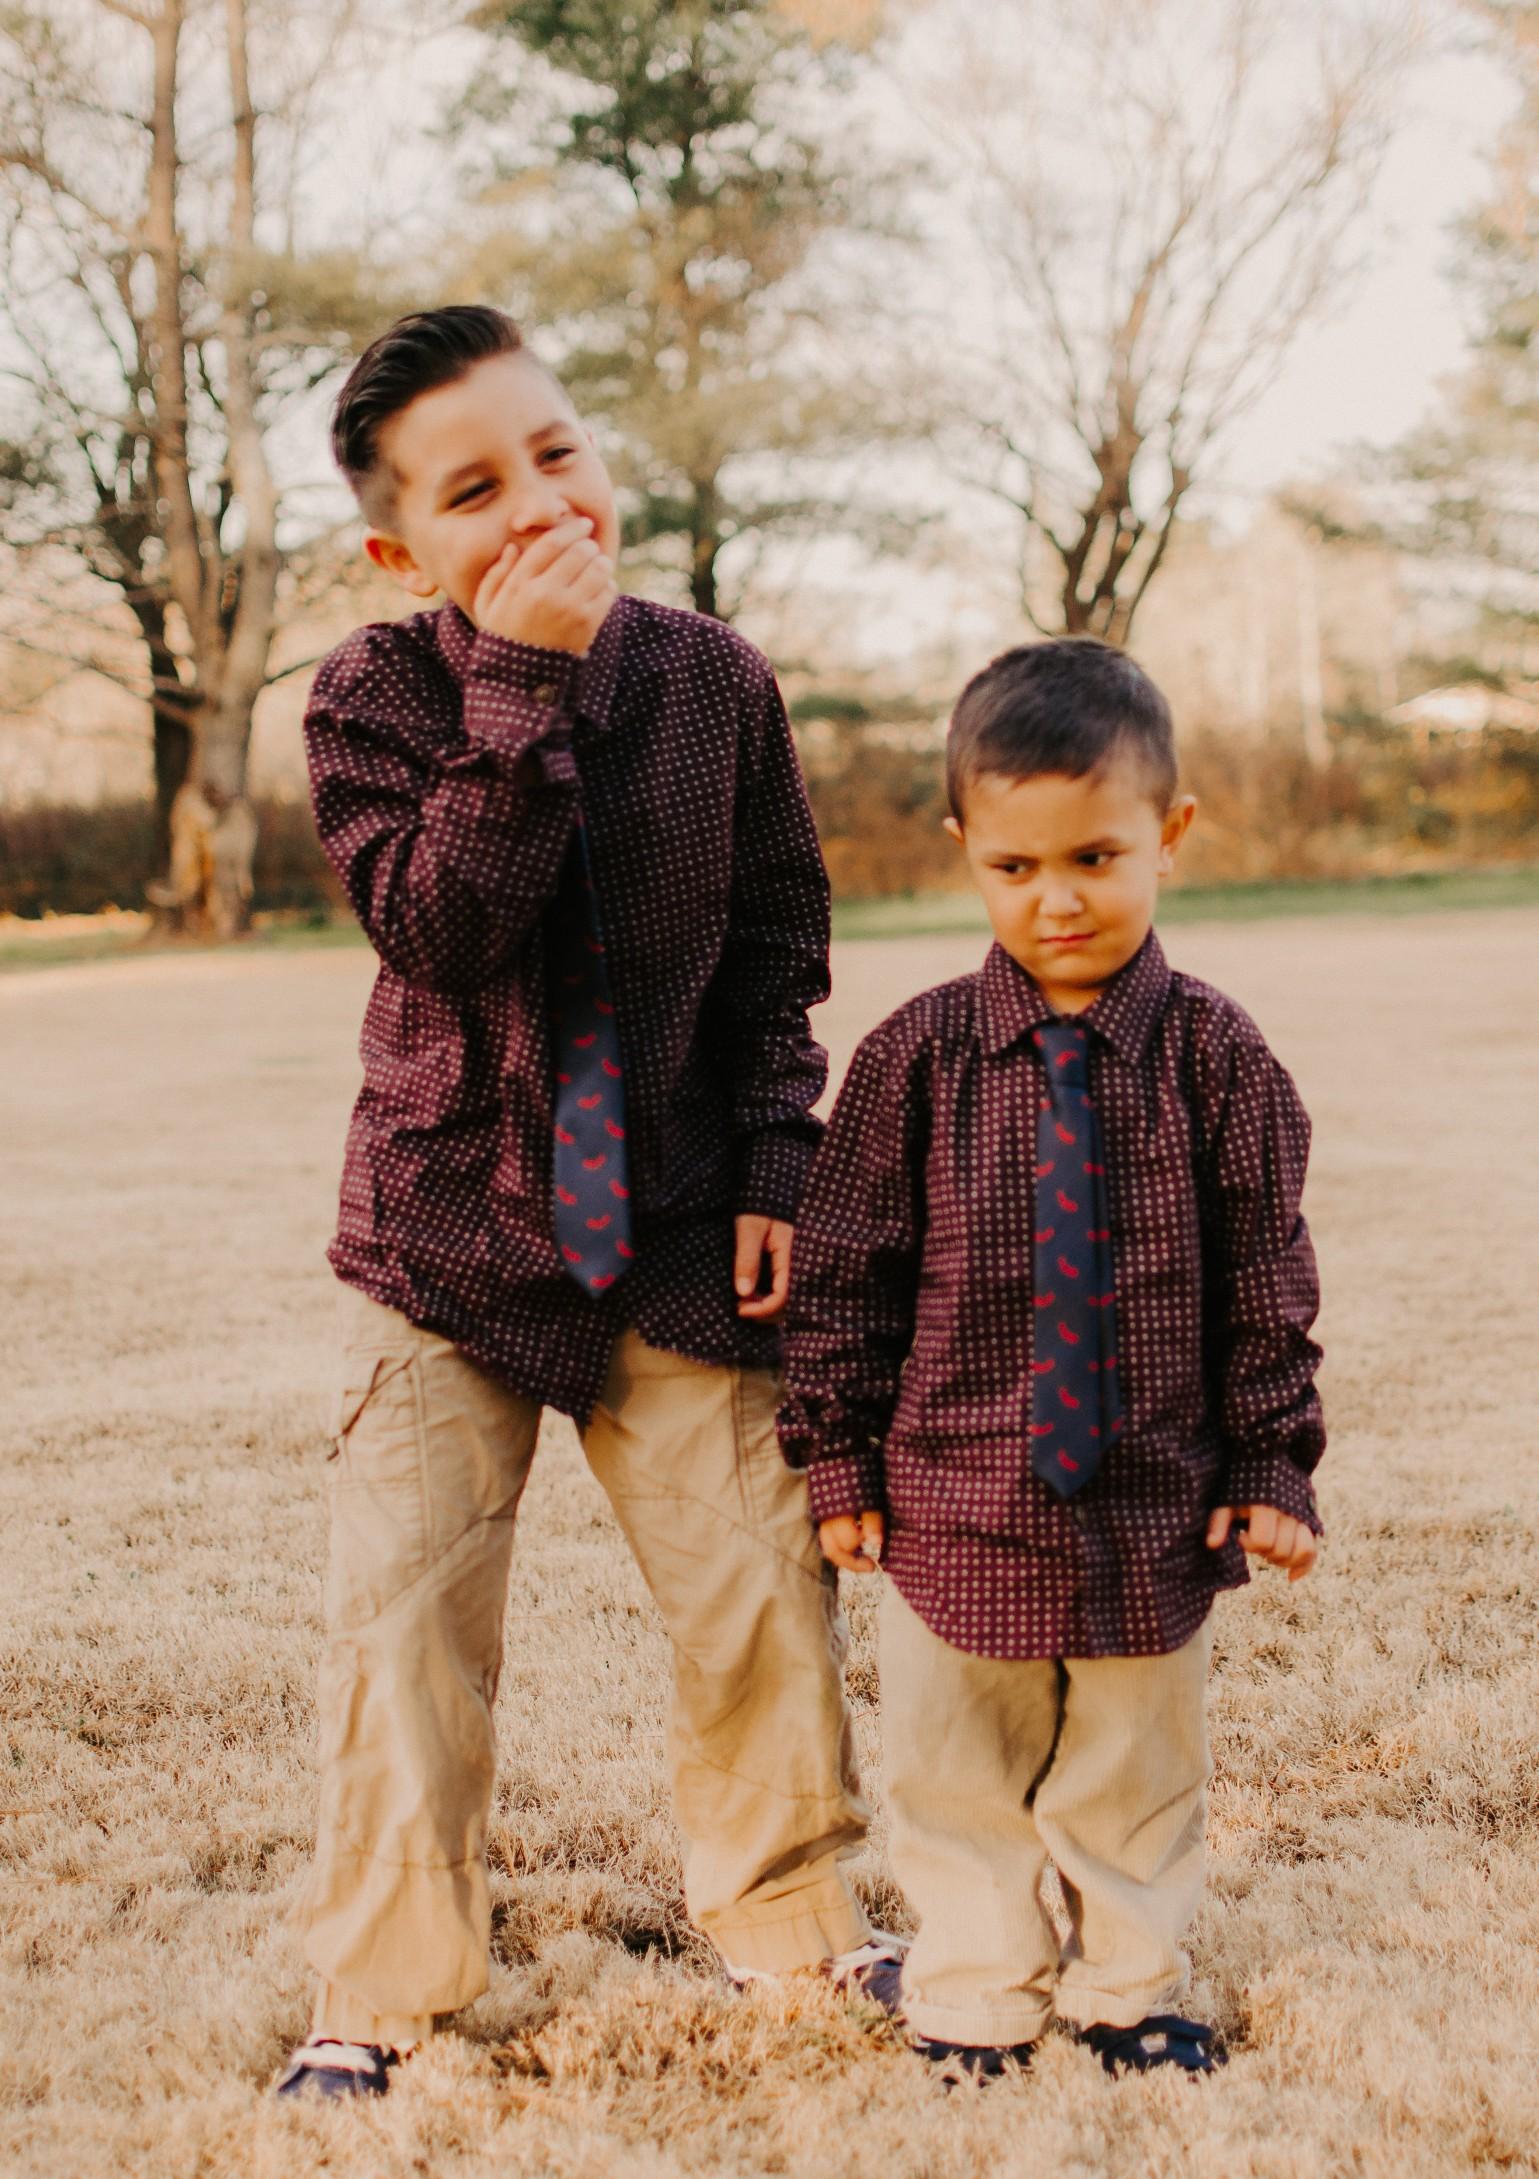 child-photography-brother-portrait.jpg.